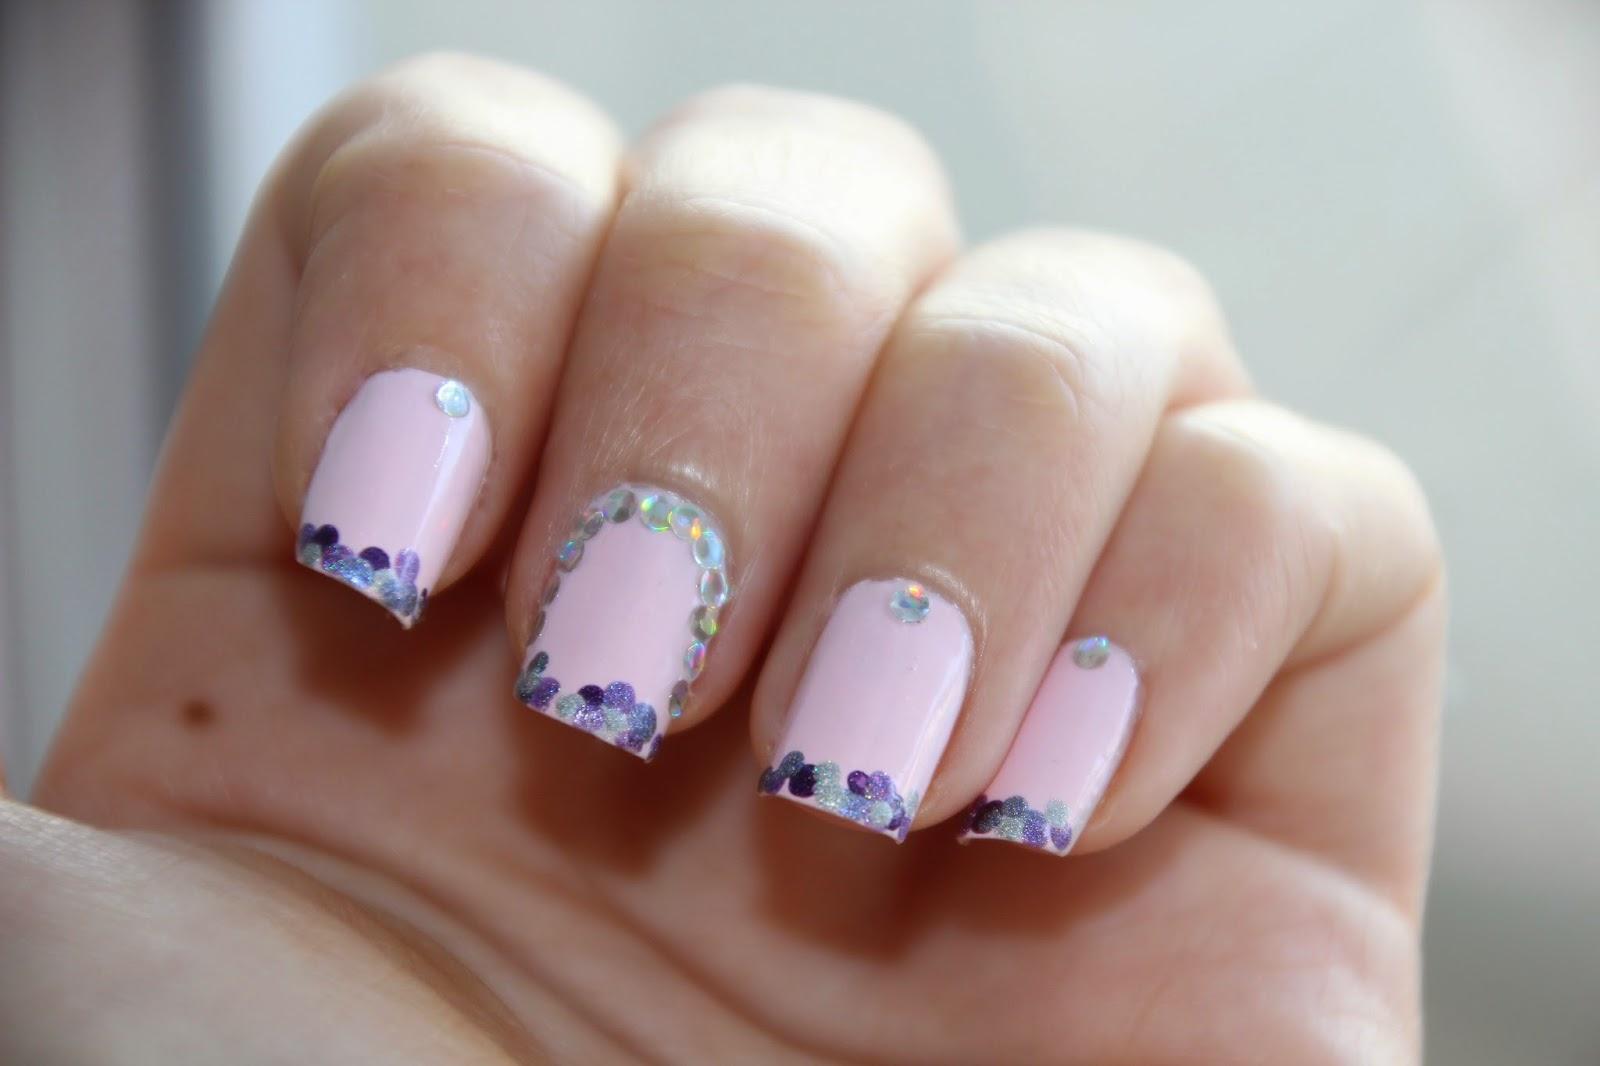 Nail Art Marathon -French manicure – JustAnAngel.net